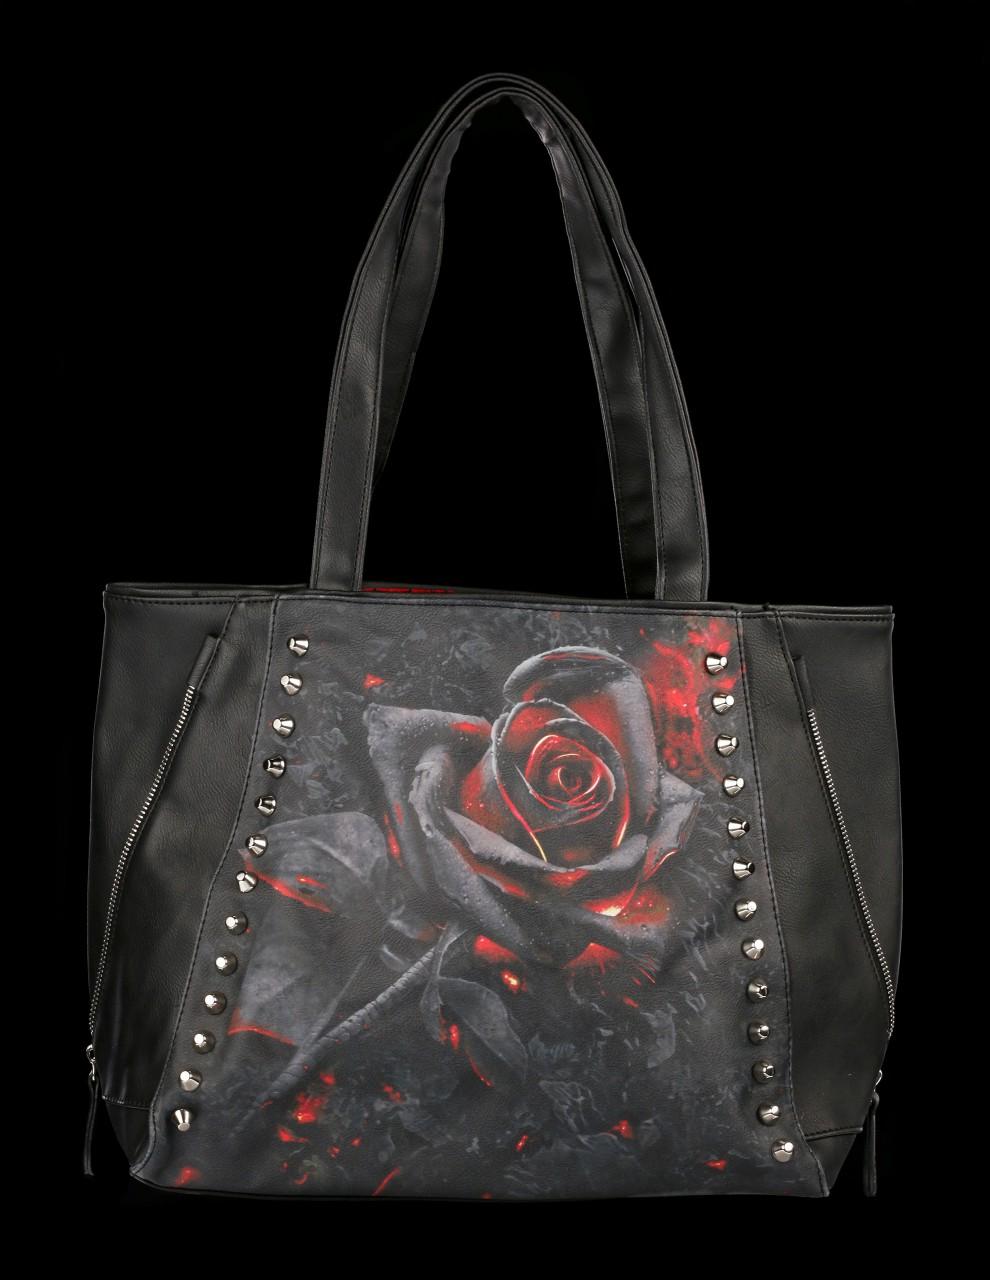 Faux Leather Bag - Burnt Rose